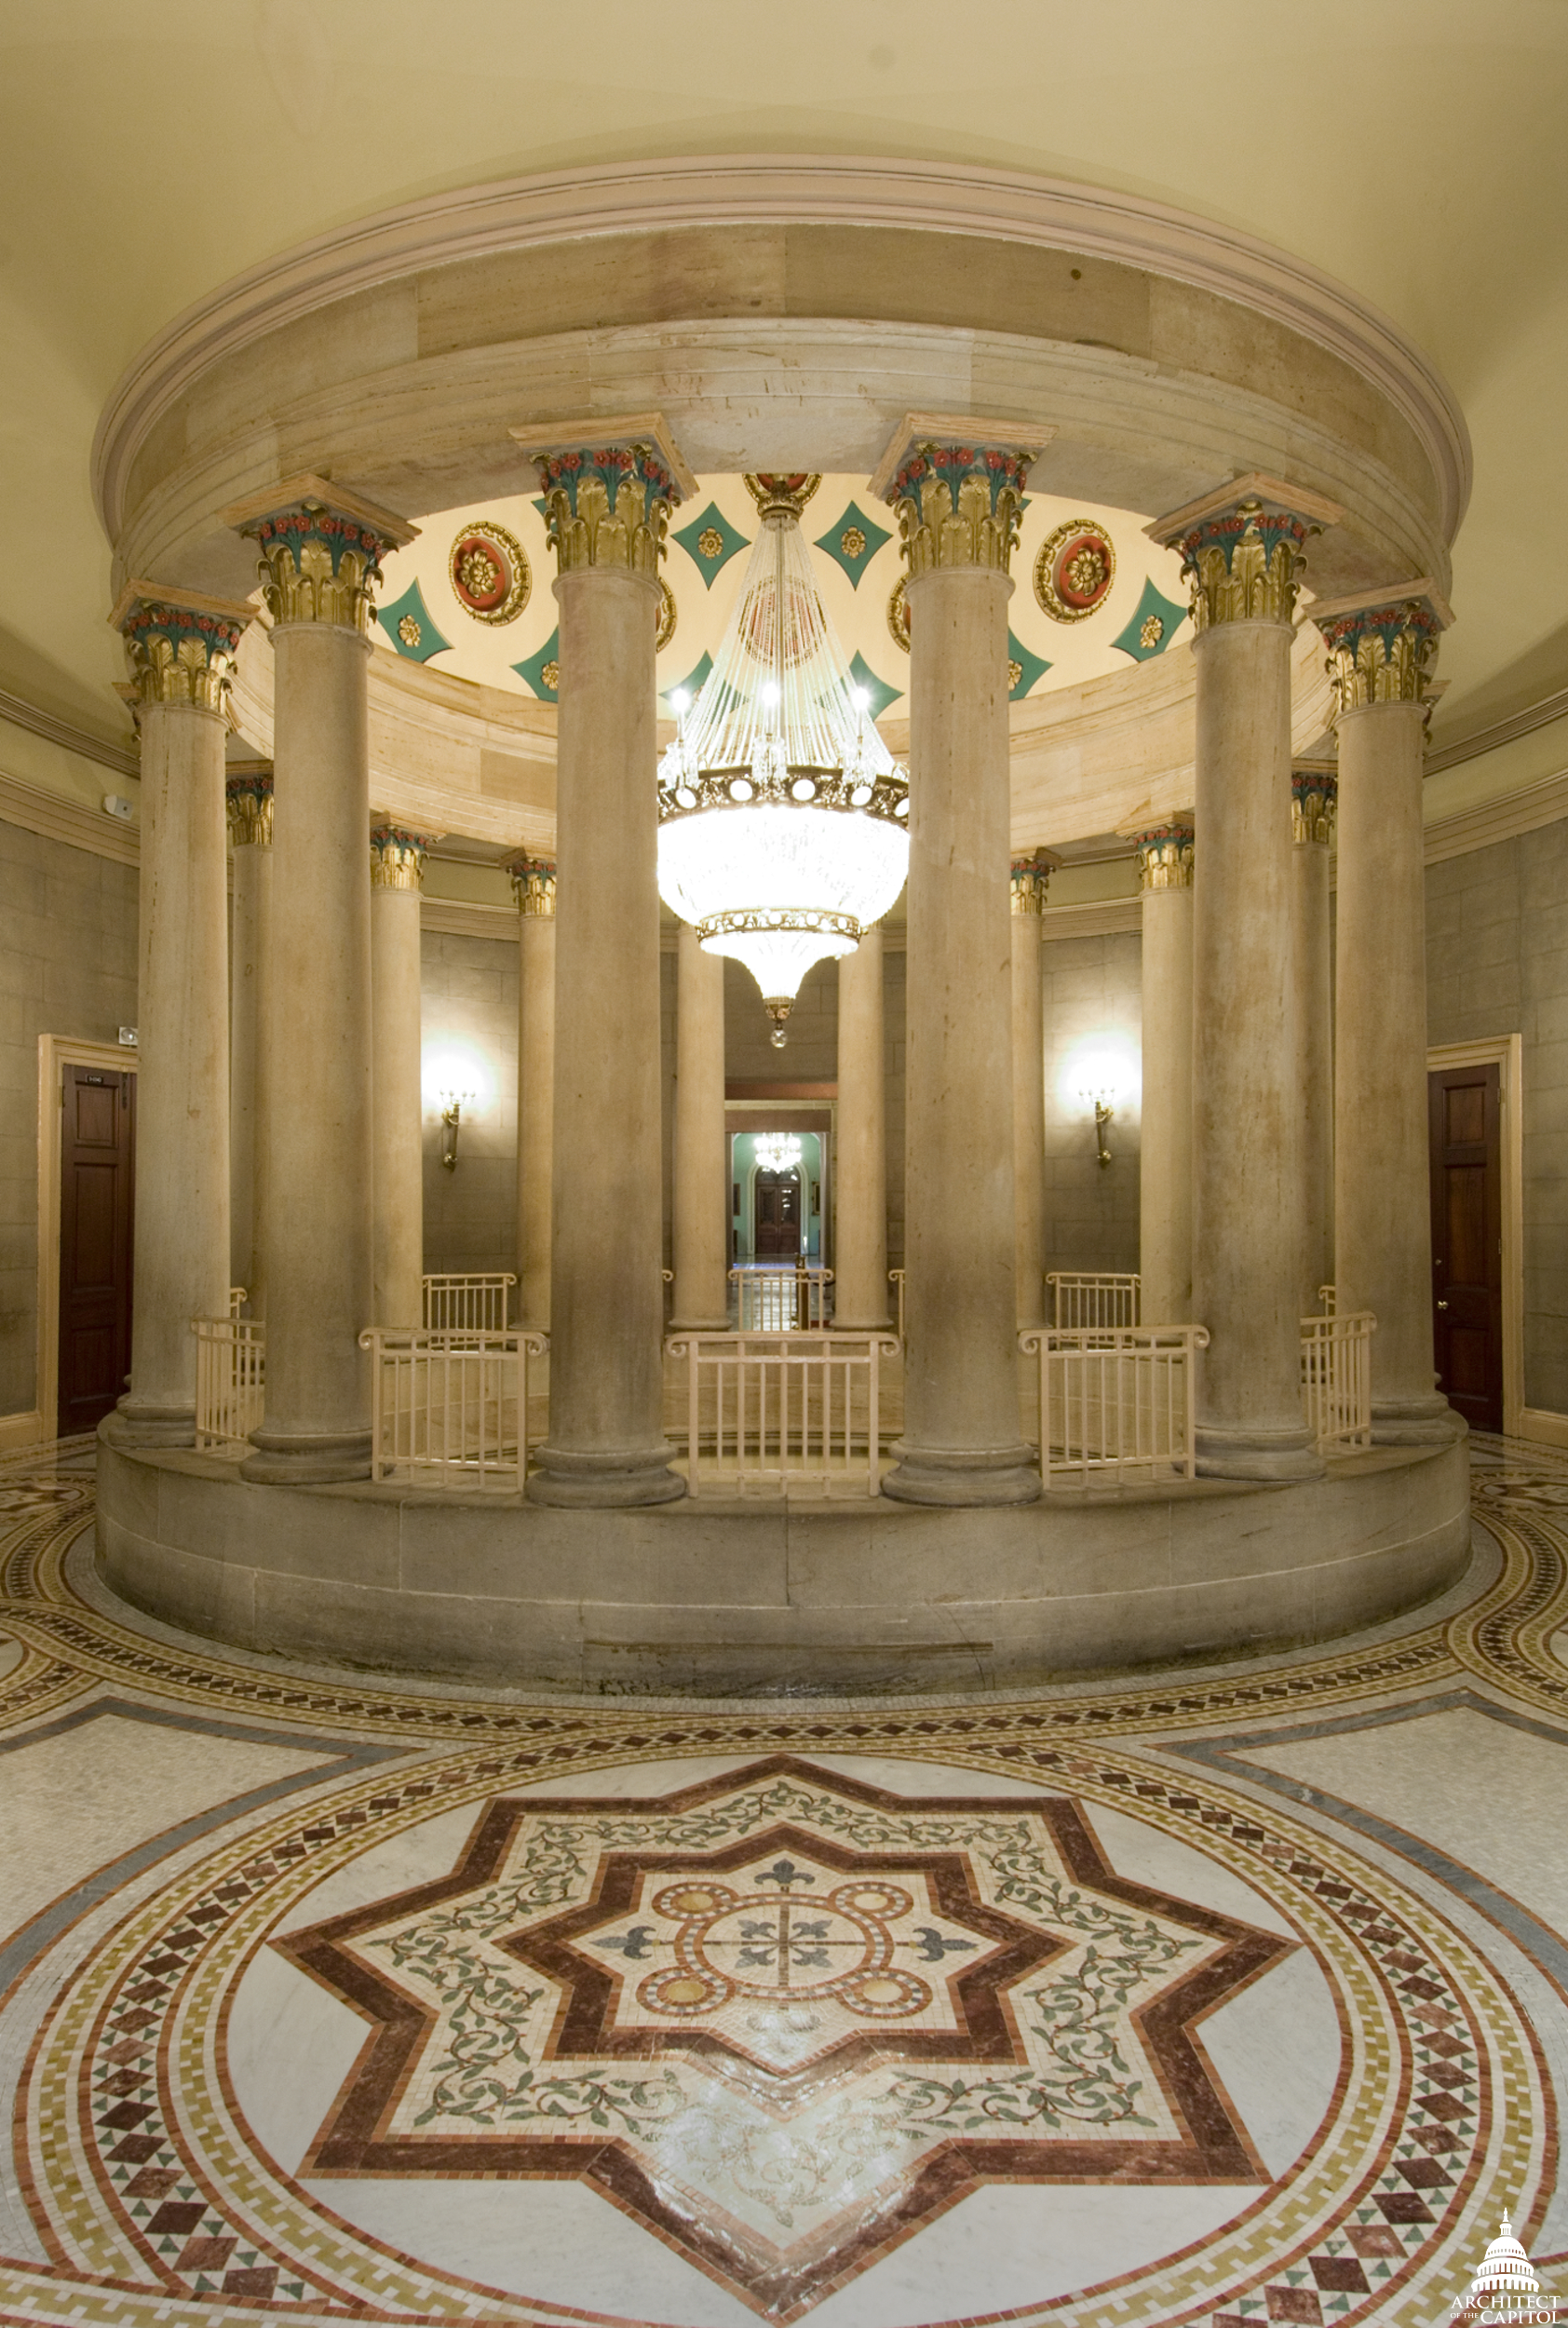 Photo of the small Senate rotunda.